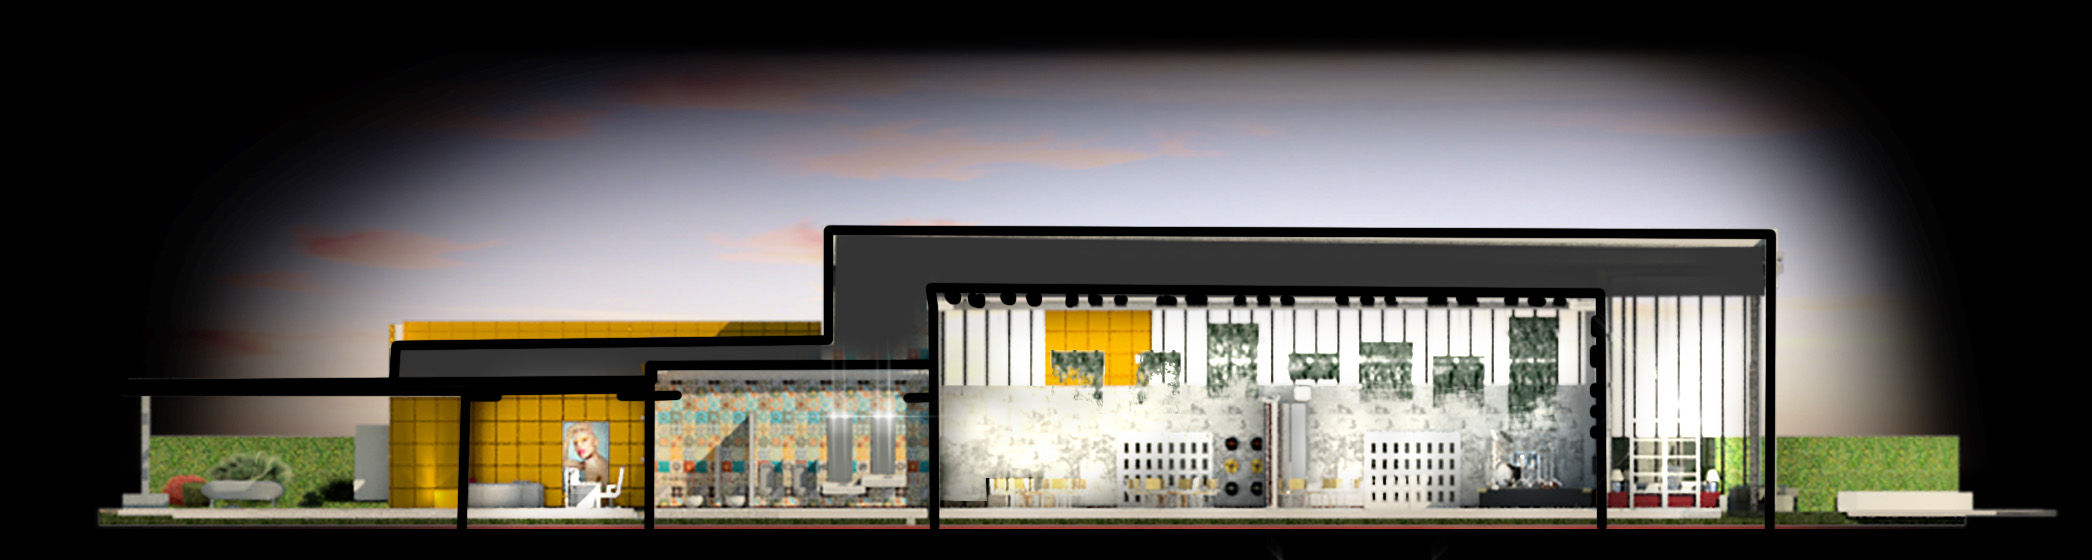 diseno casas d diseno casa club tesis v autodesk online gallery